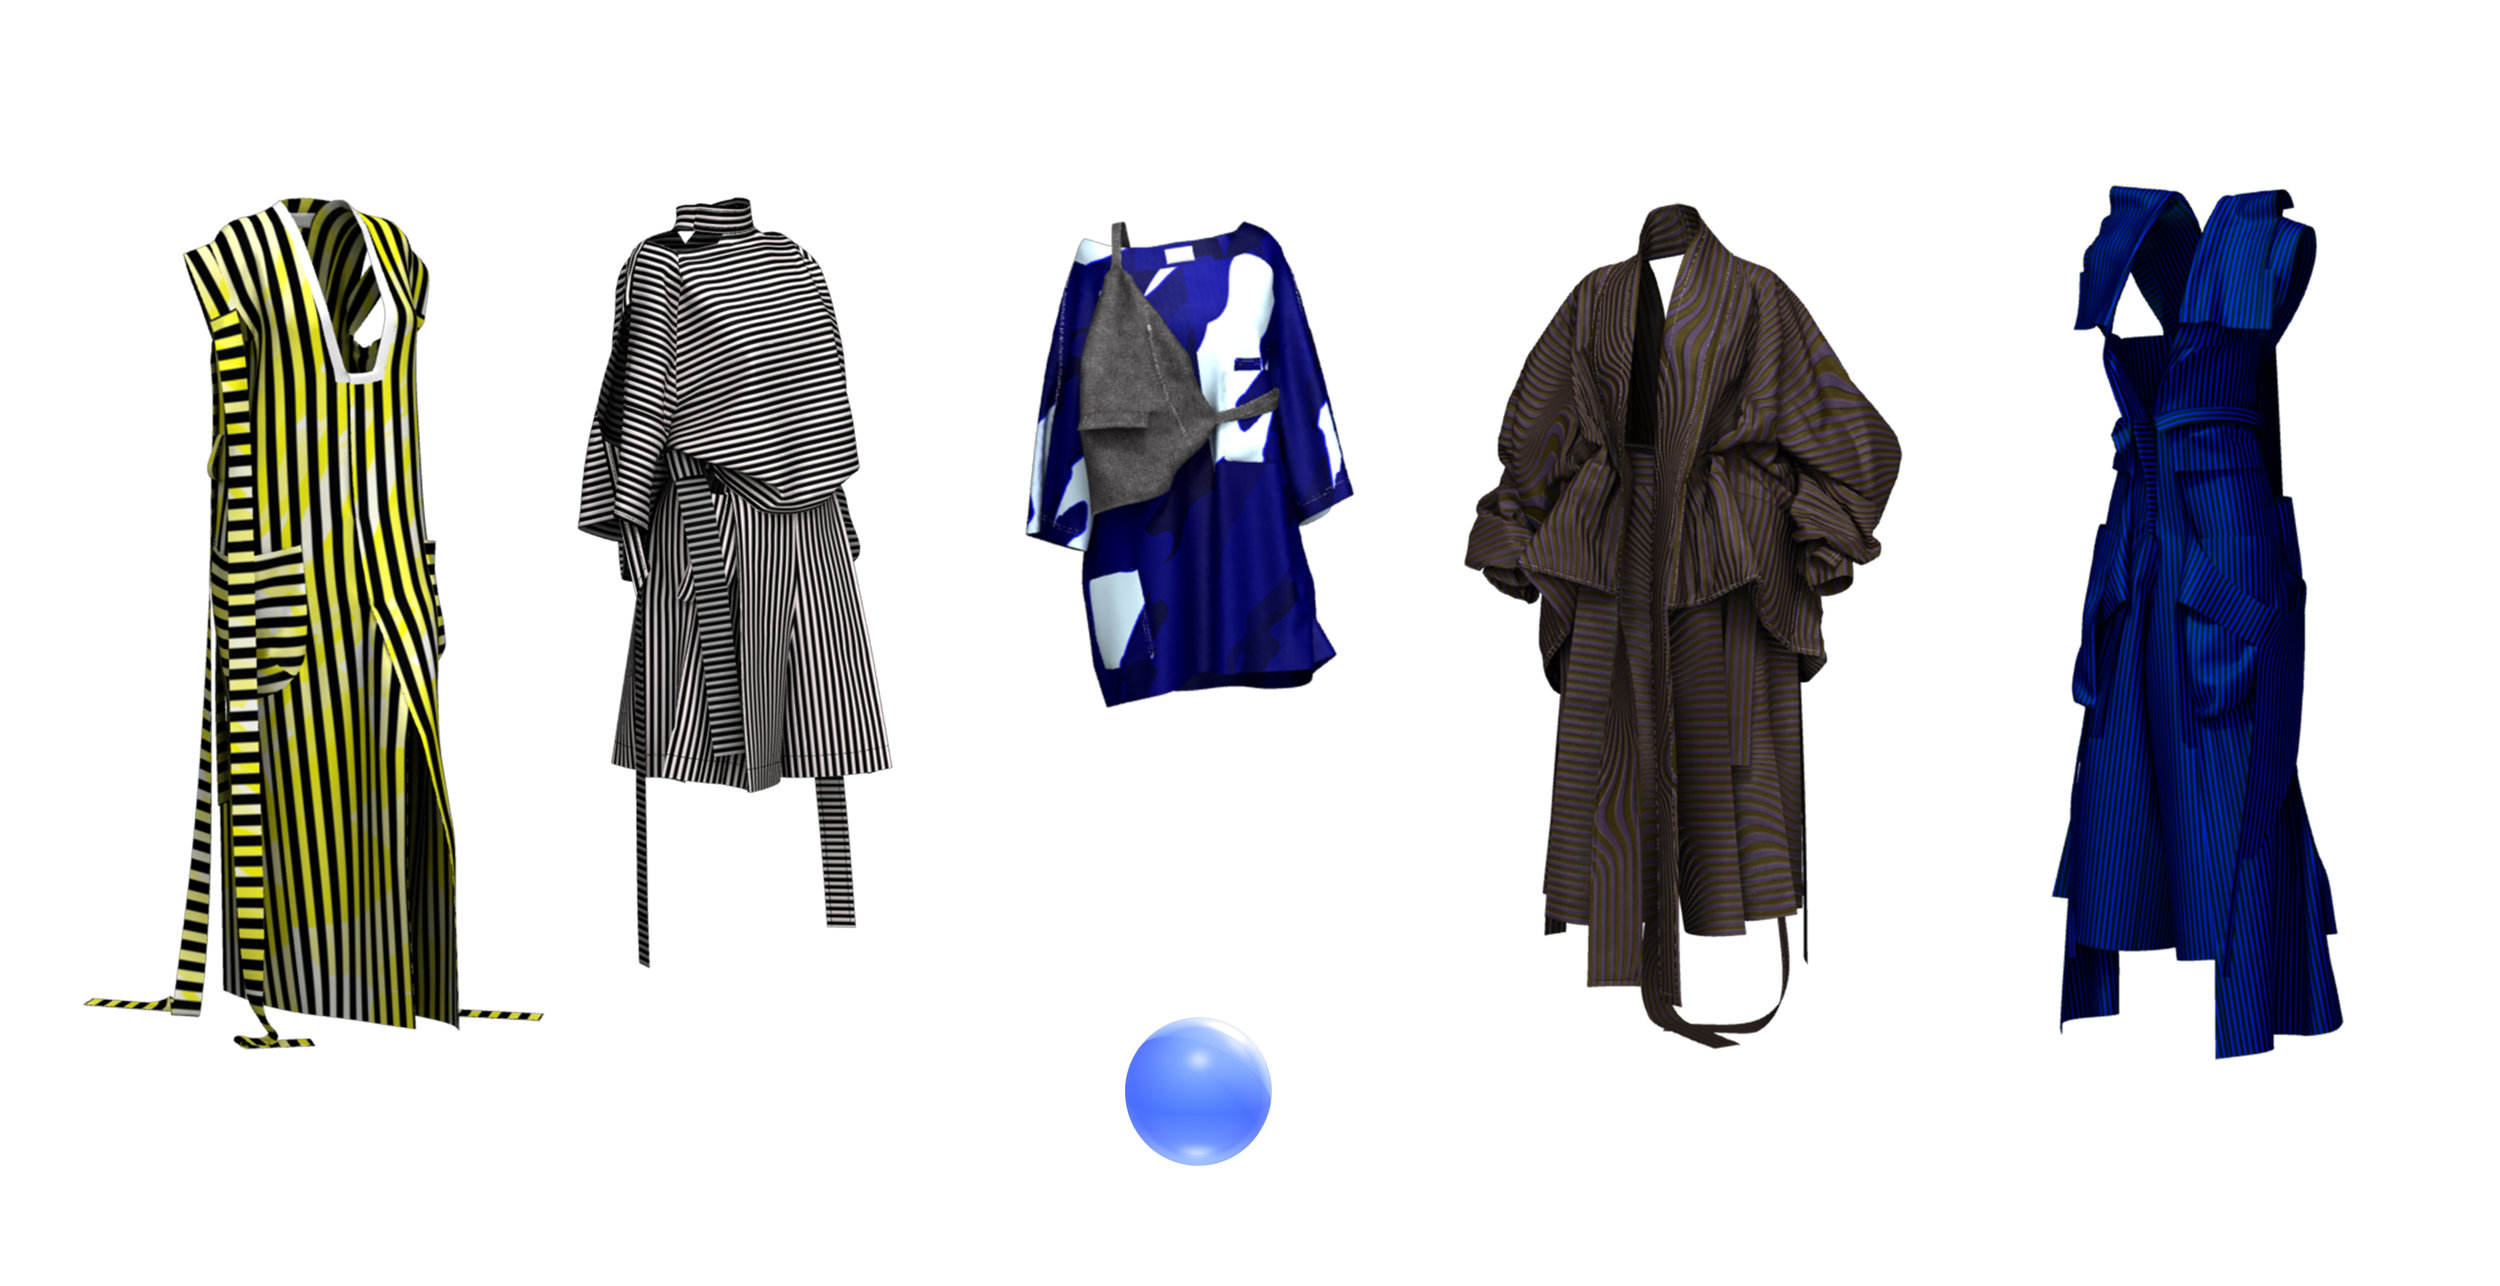 KARMA DRESS . 001    NOFEETEE+HAKAMASHORT     NOMANTEEX        KIMONO_001+HAKAMA       KARMA JUMPSUIT.001